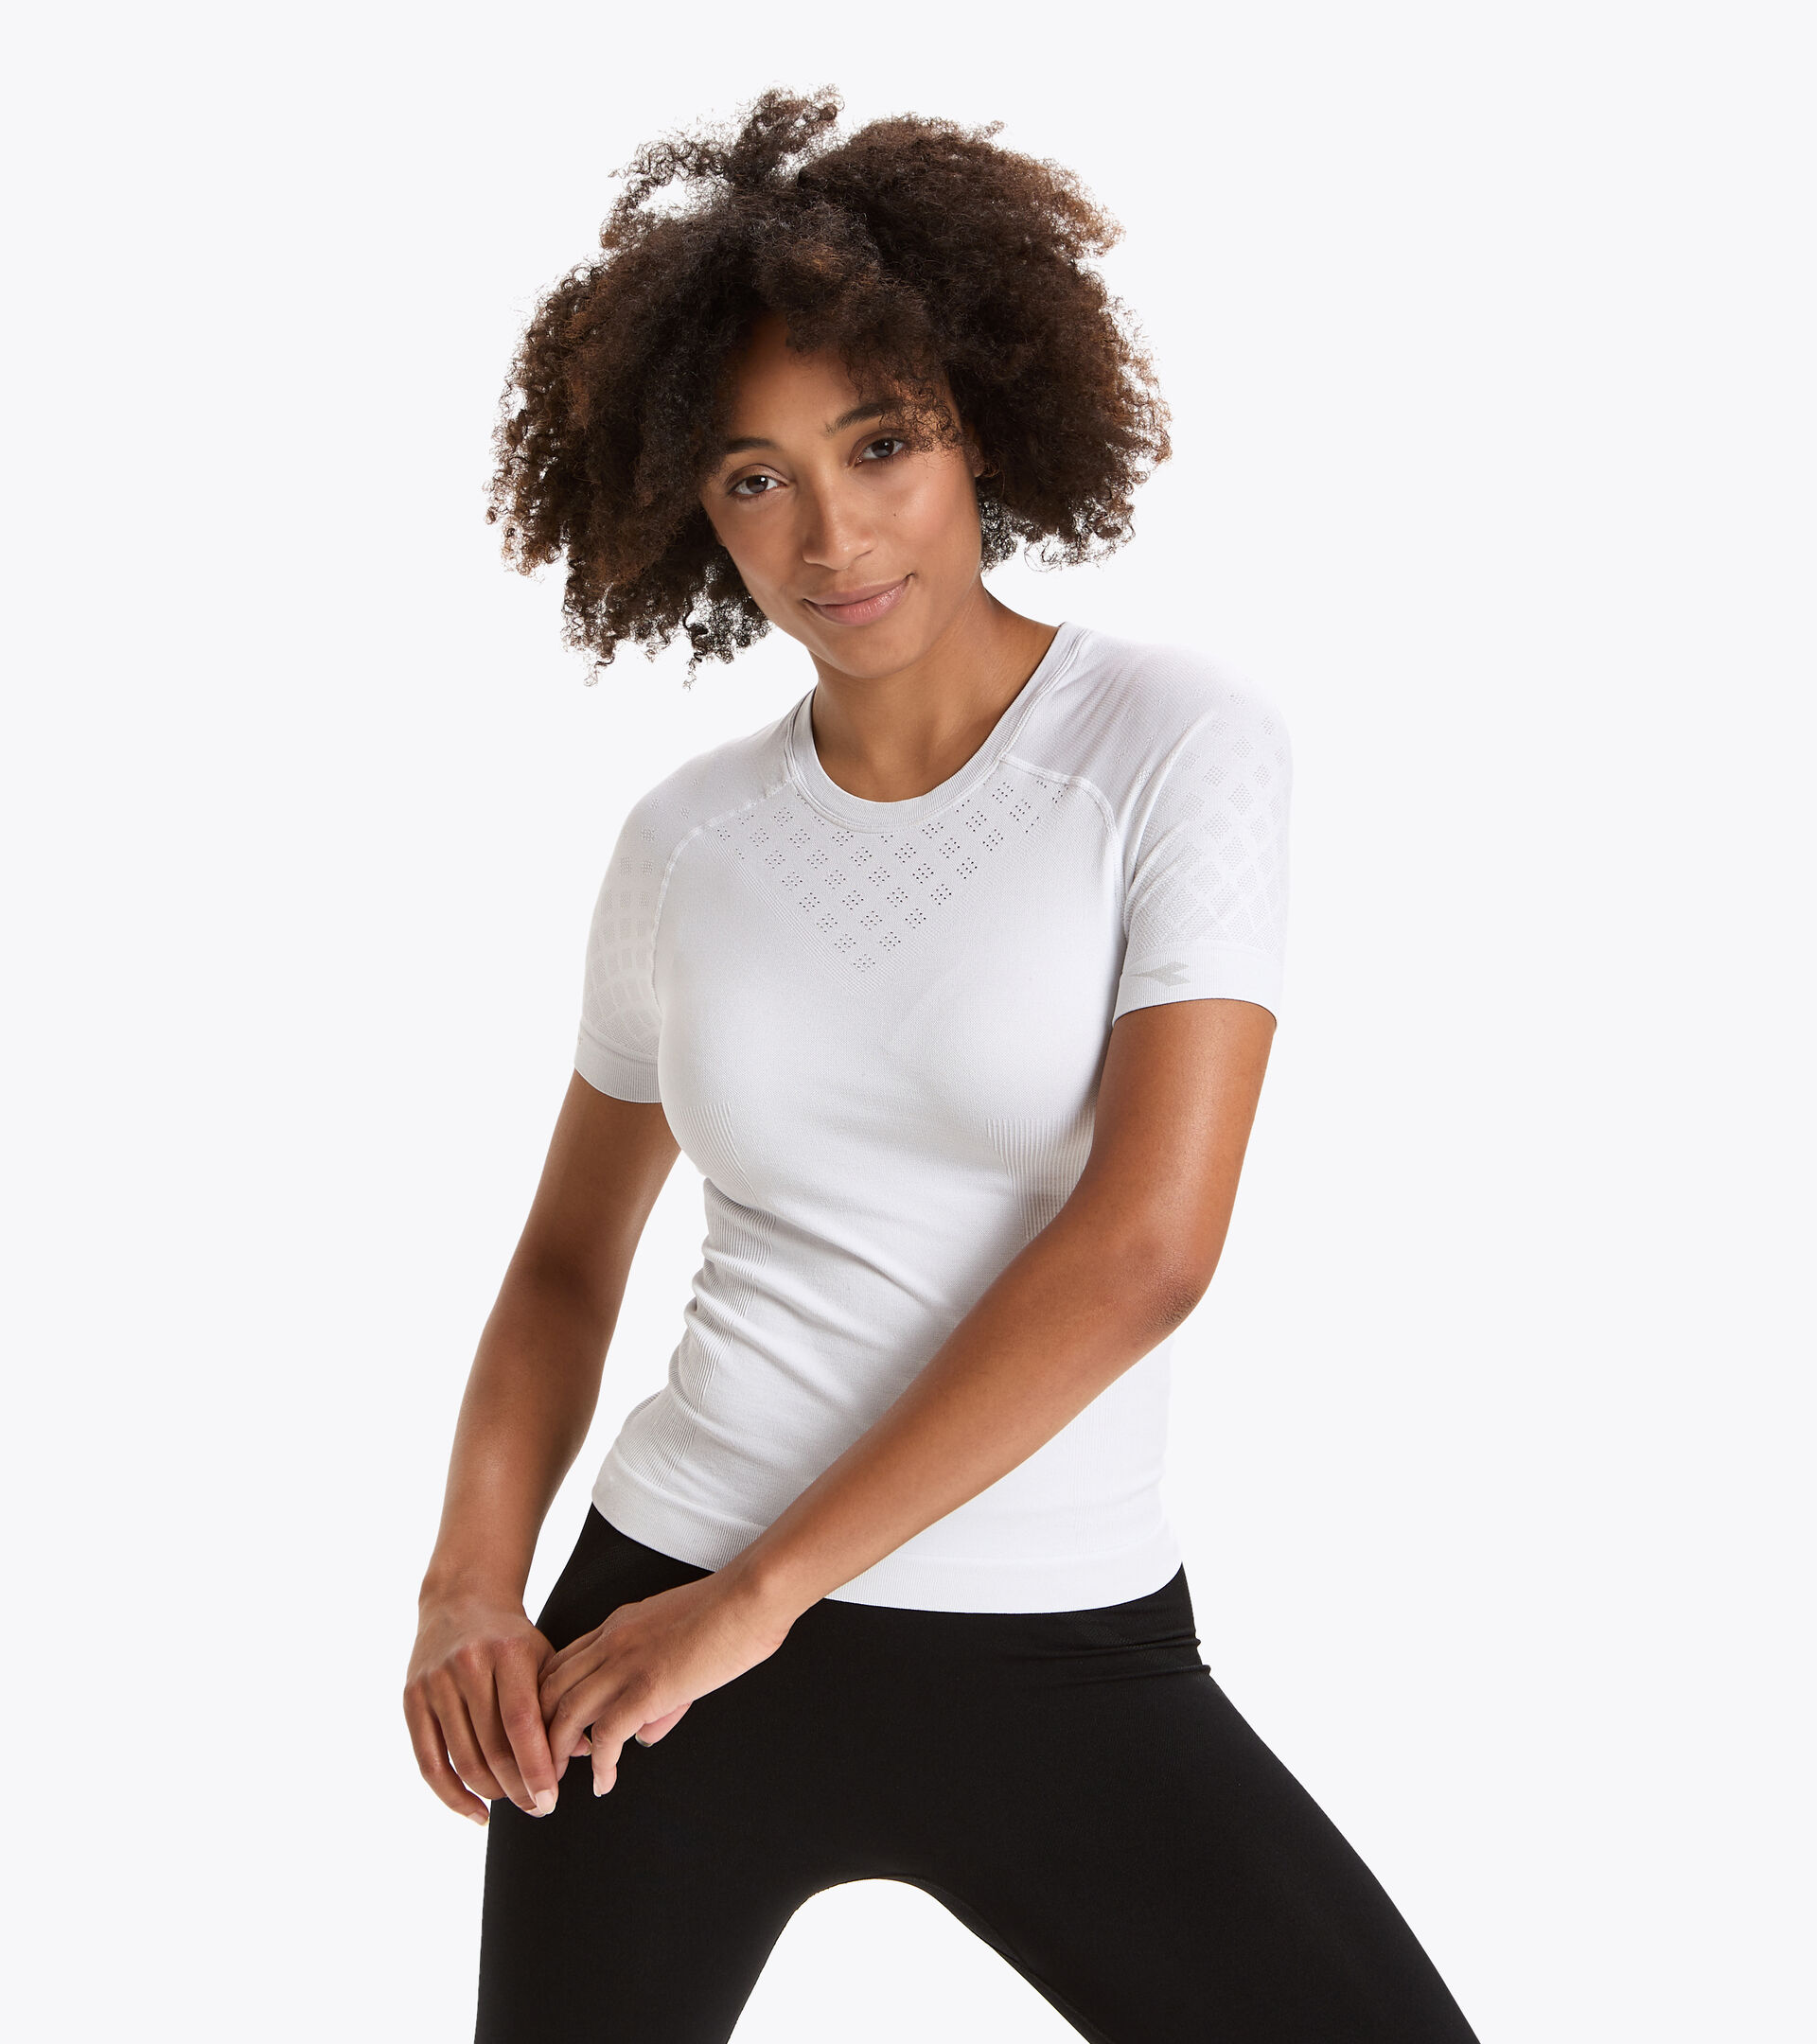 Camiseta de entrenamiento de manga corta - Mujer L. SS T-SHIRT ACT BLANCO VIVO - Diadora